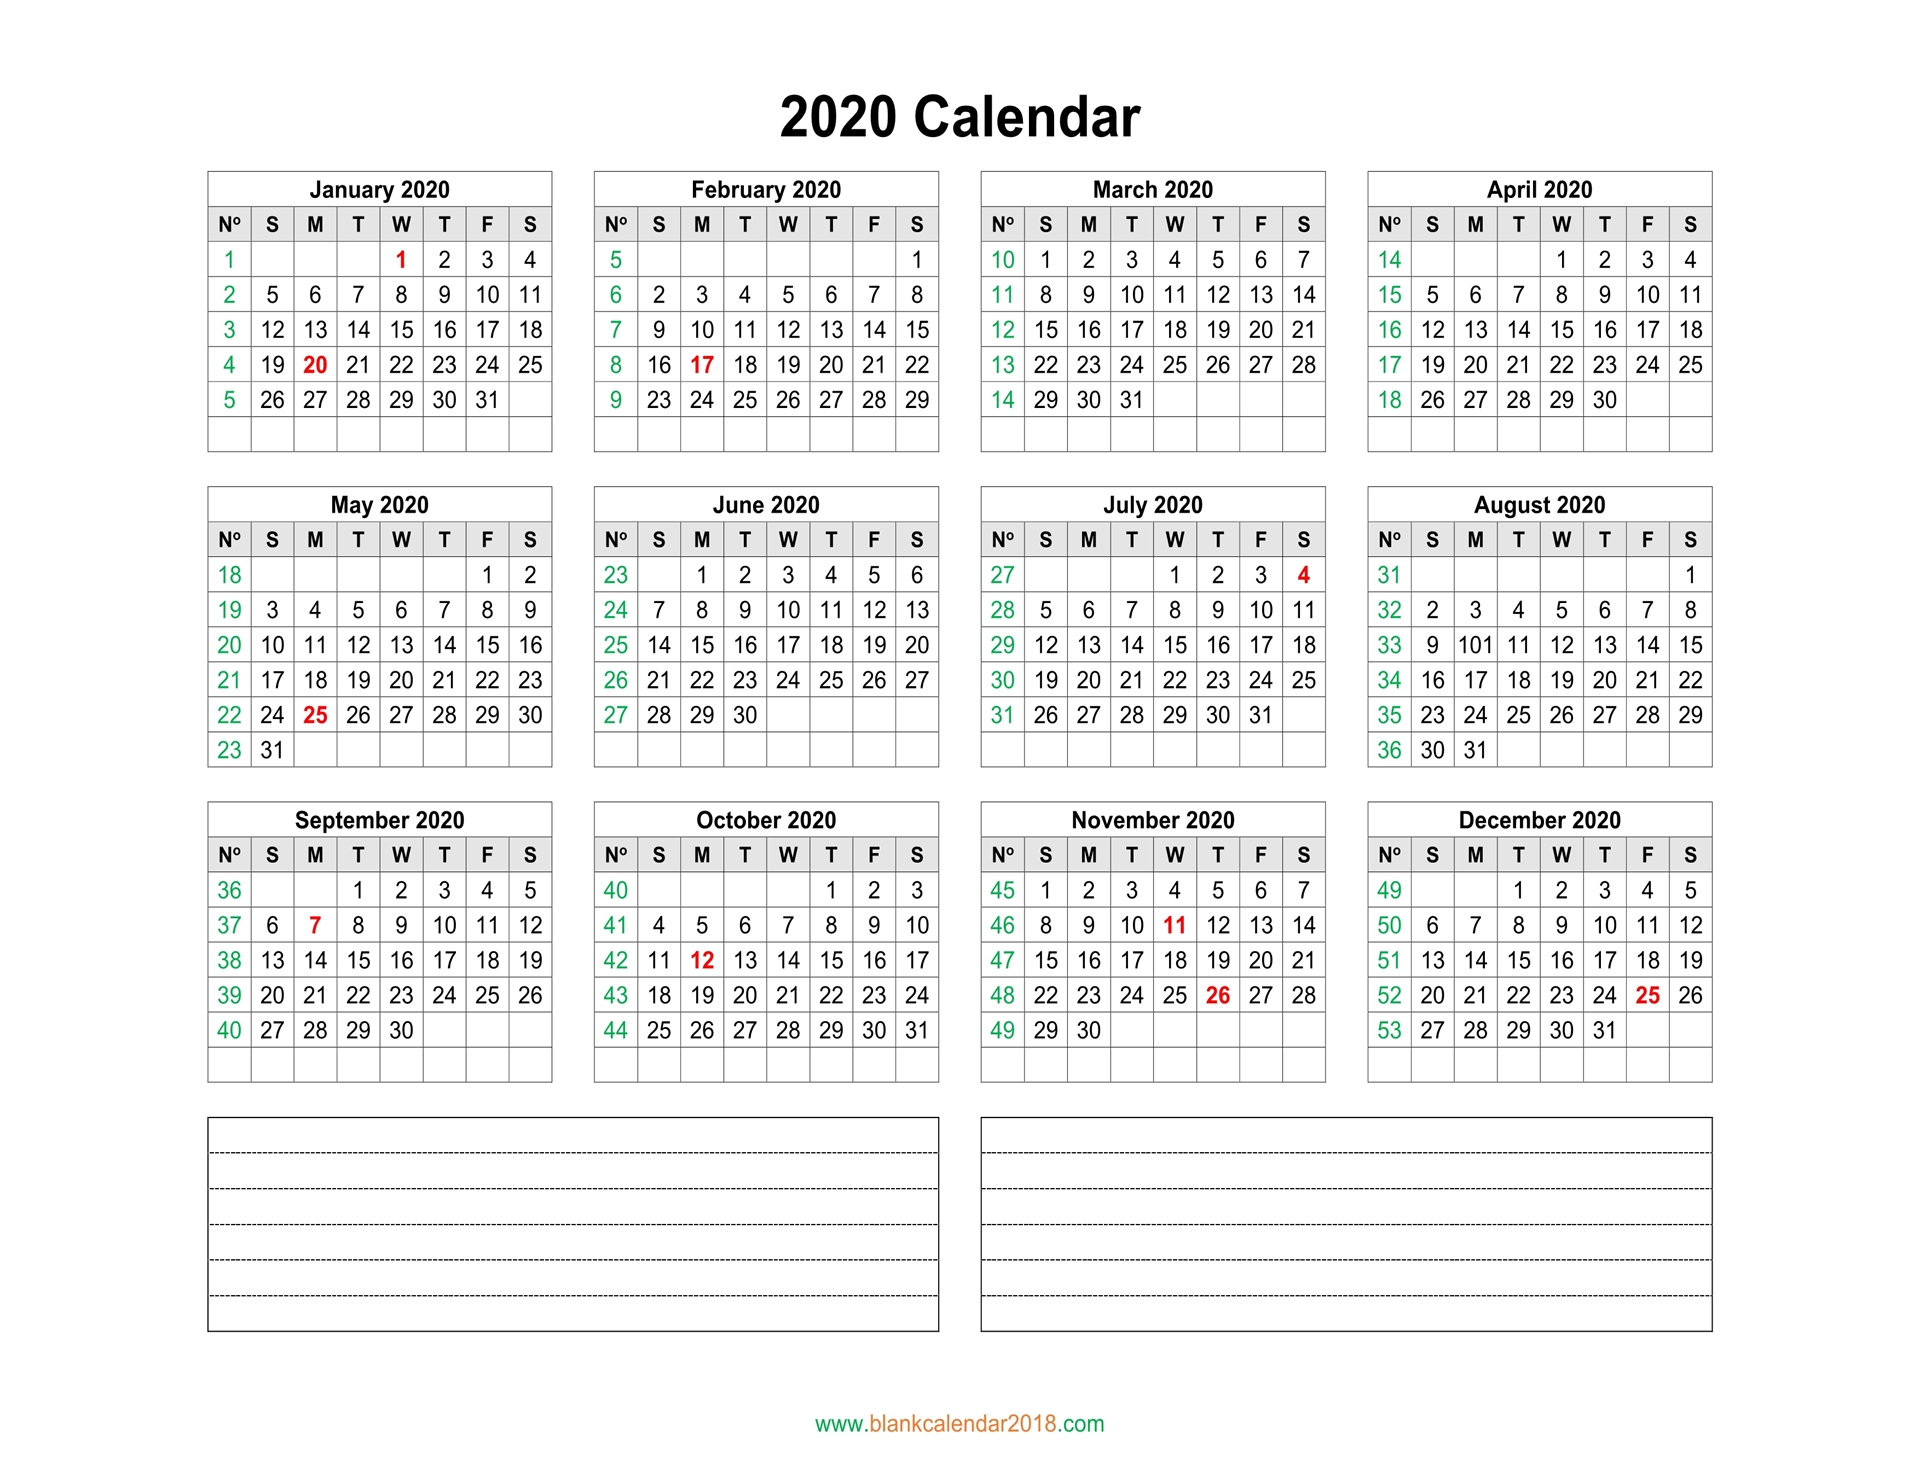 Blank Calendar 2020 regarding Yearly Printable Calendar 2020